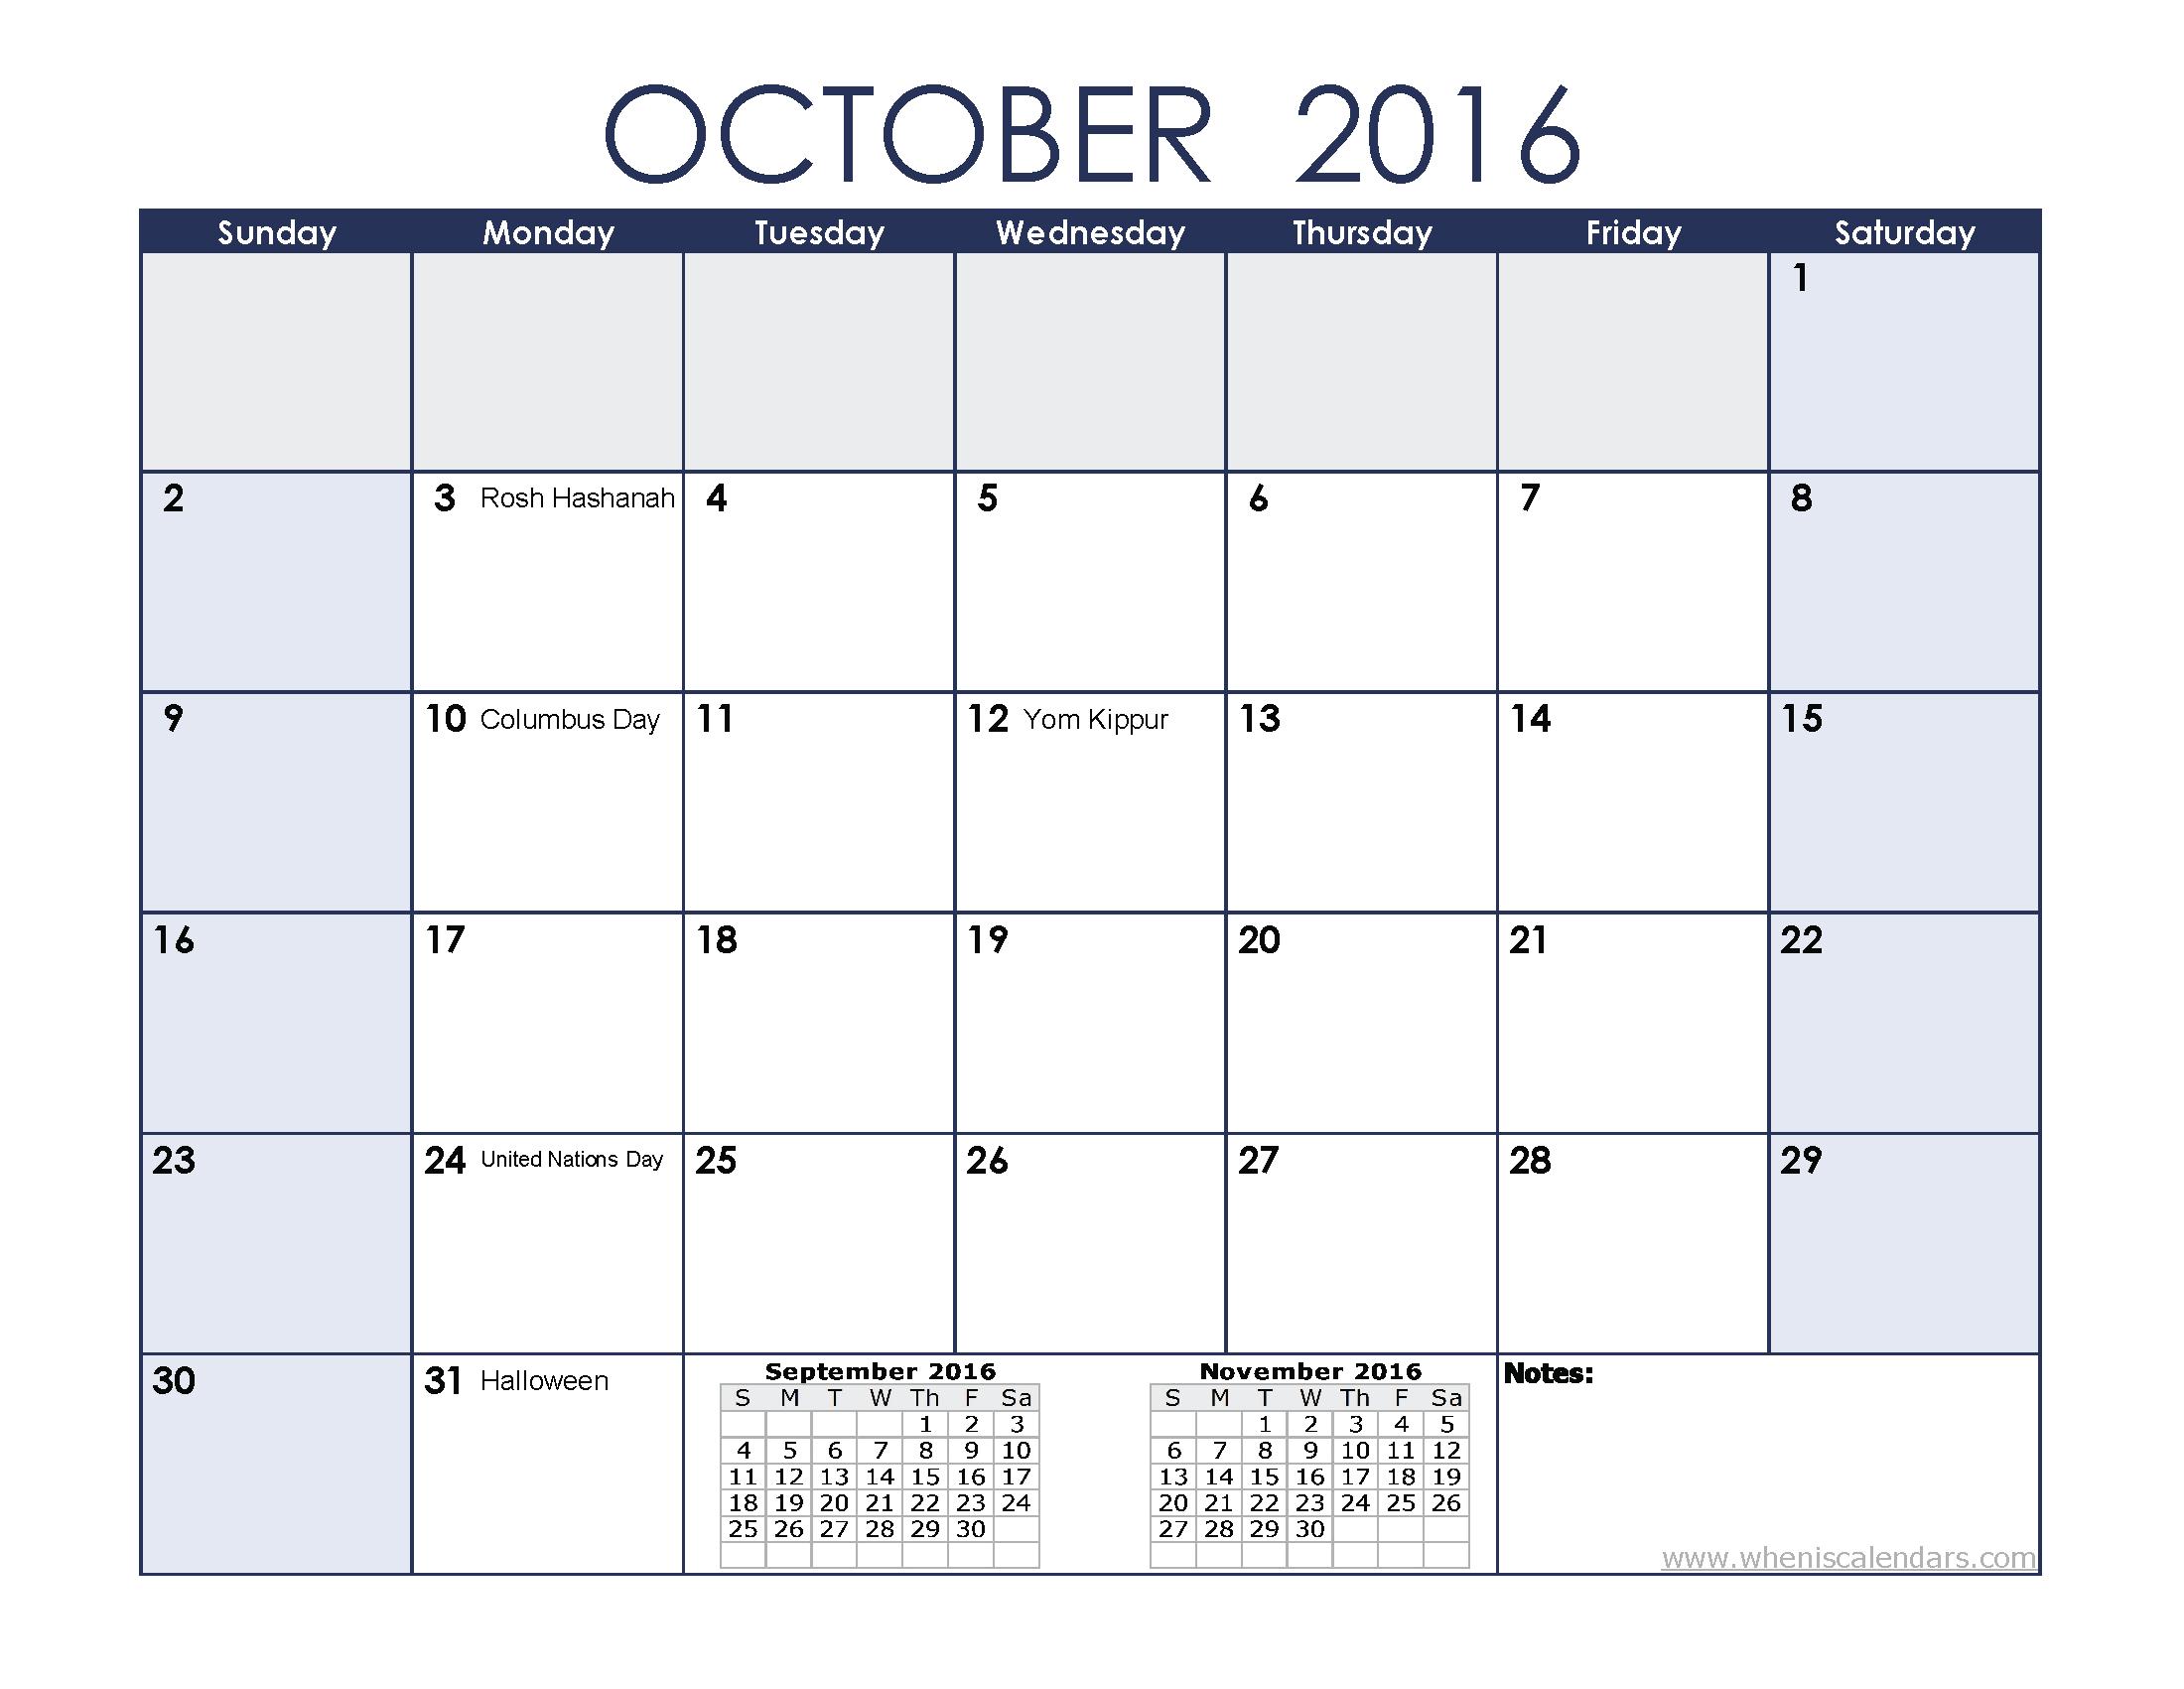 October 2016 Calendar Excel Template